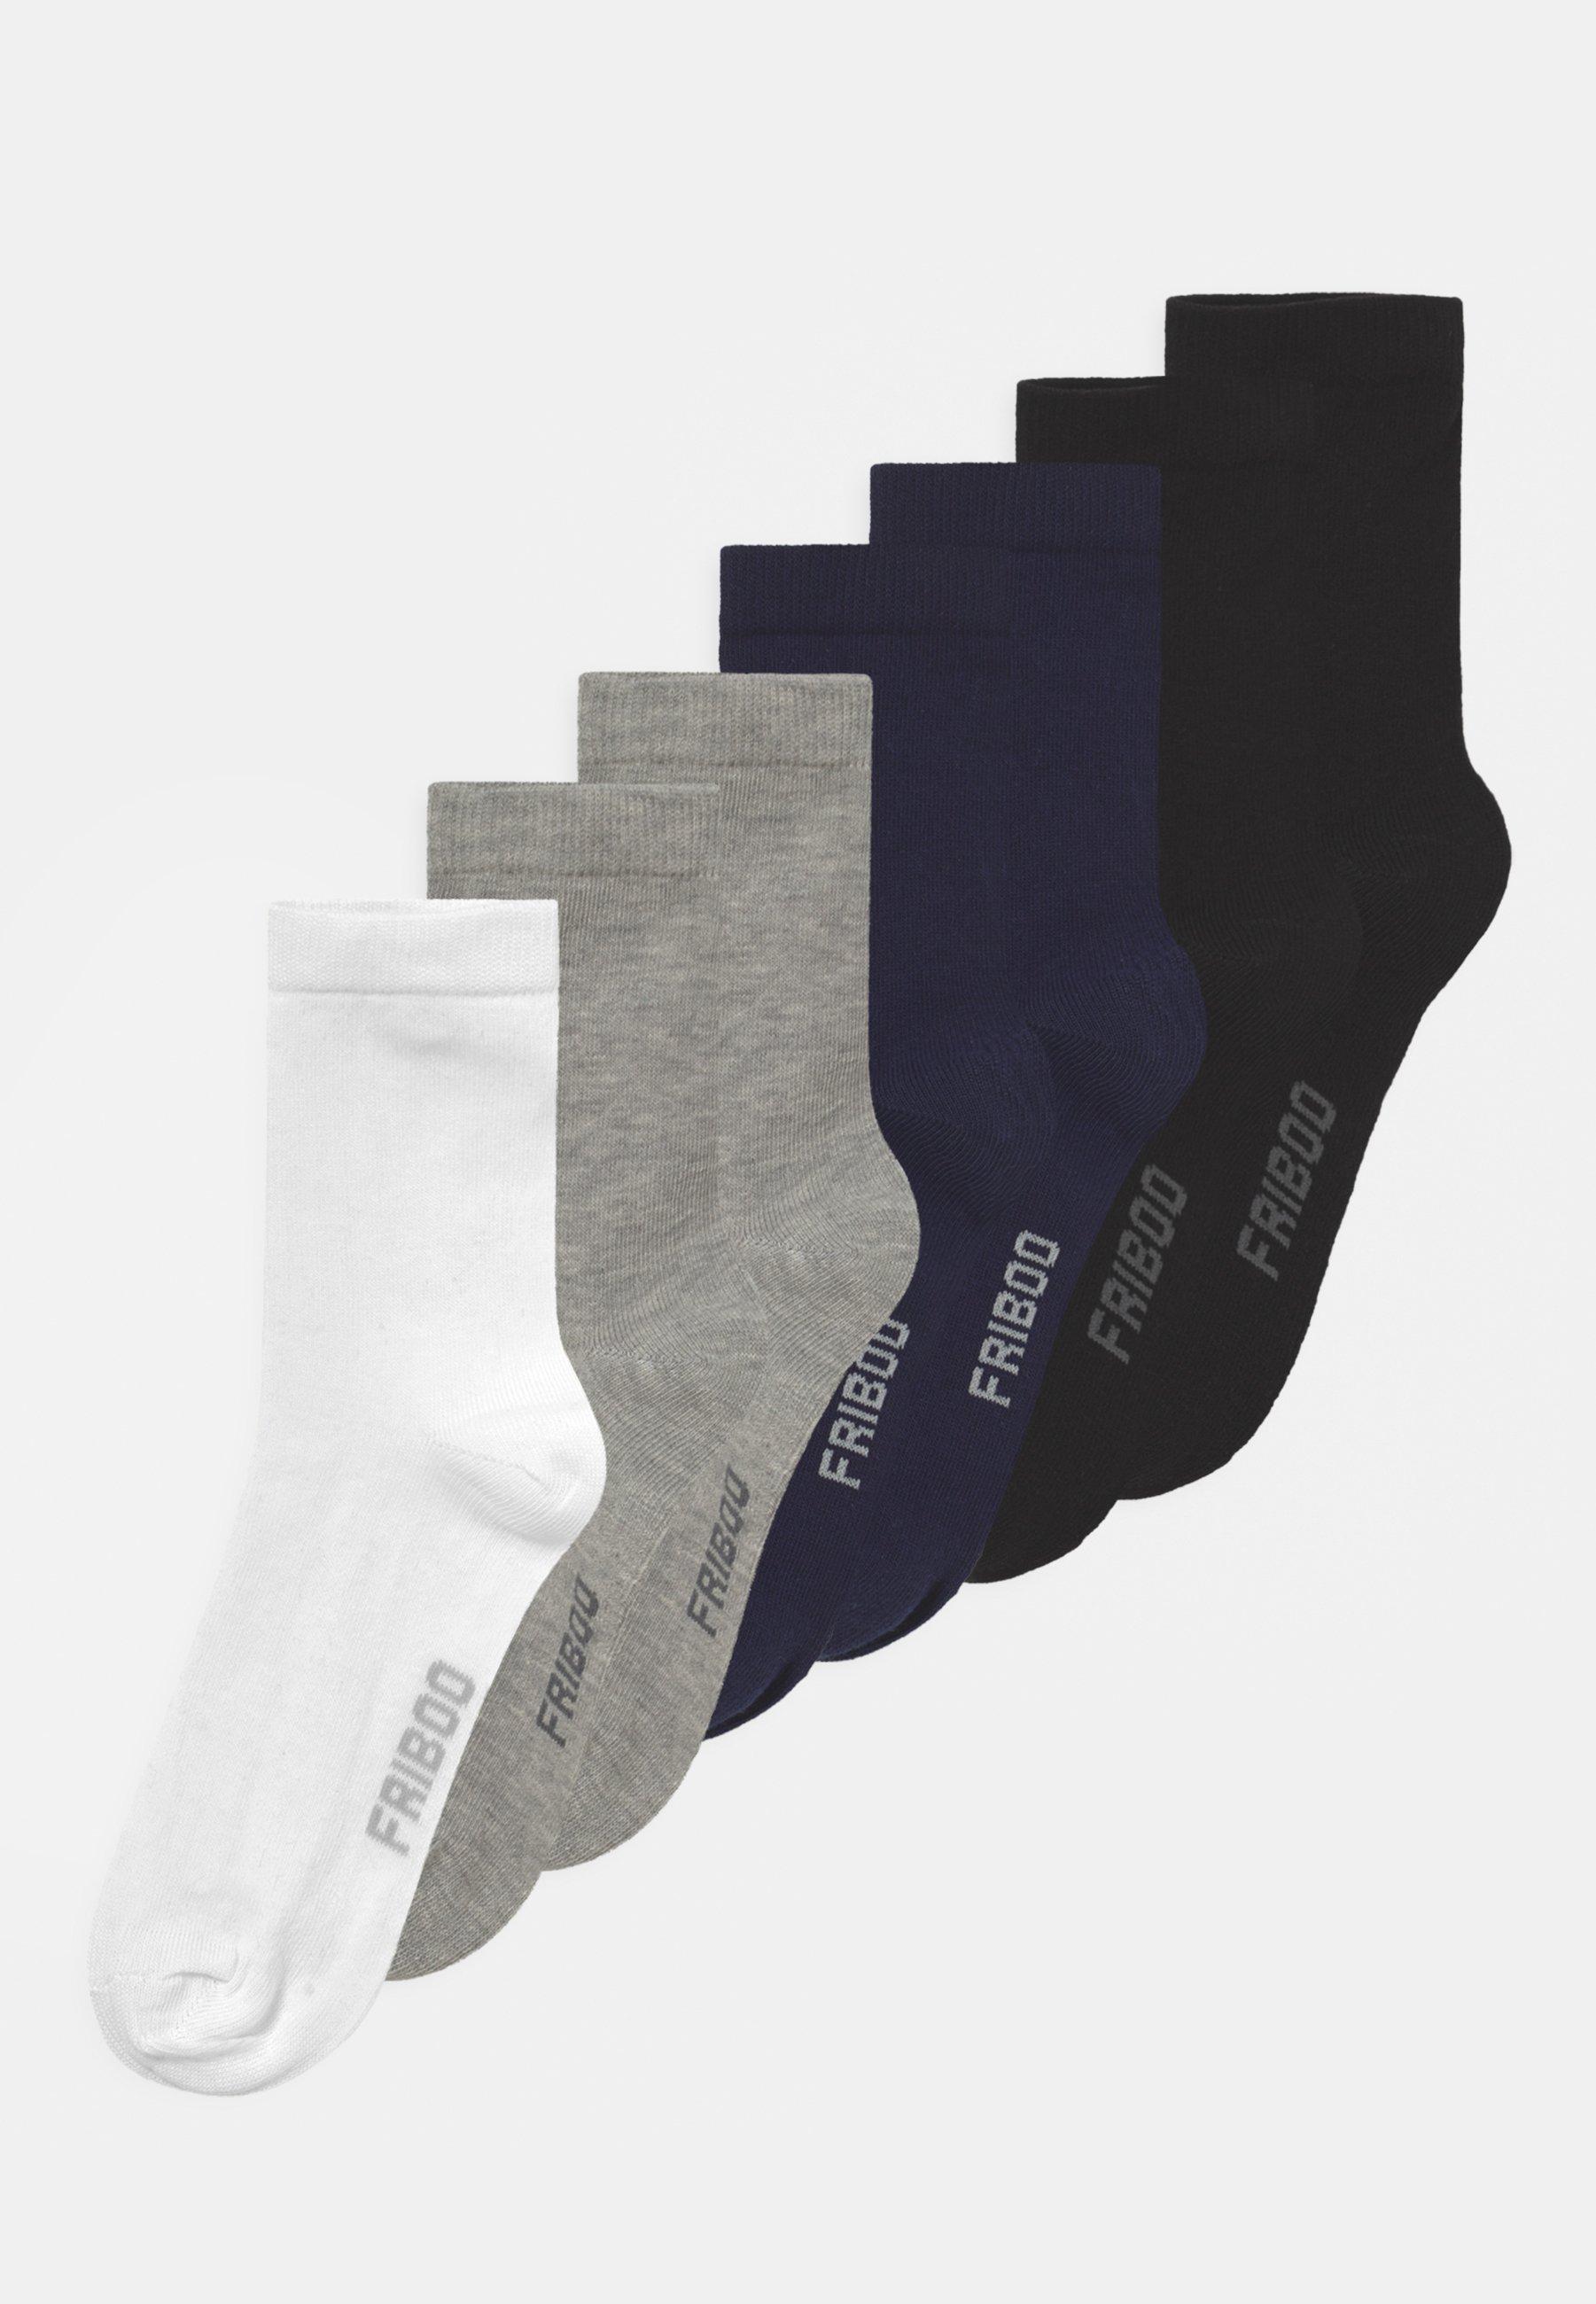 Kinder 7 PACK UNISEX  - Socken - black/dark blue/grey